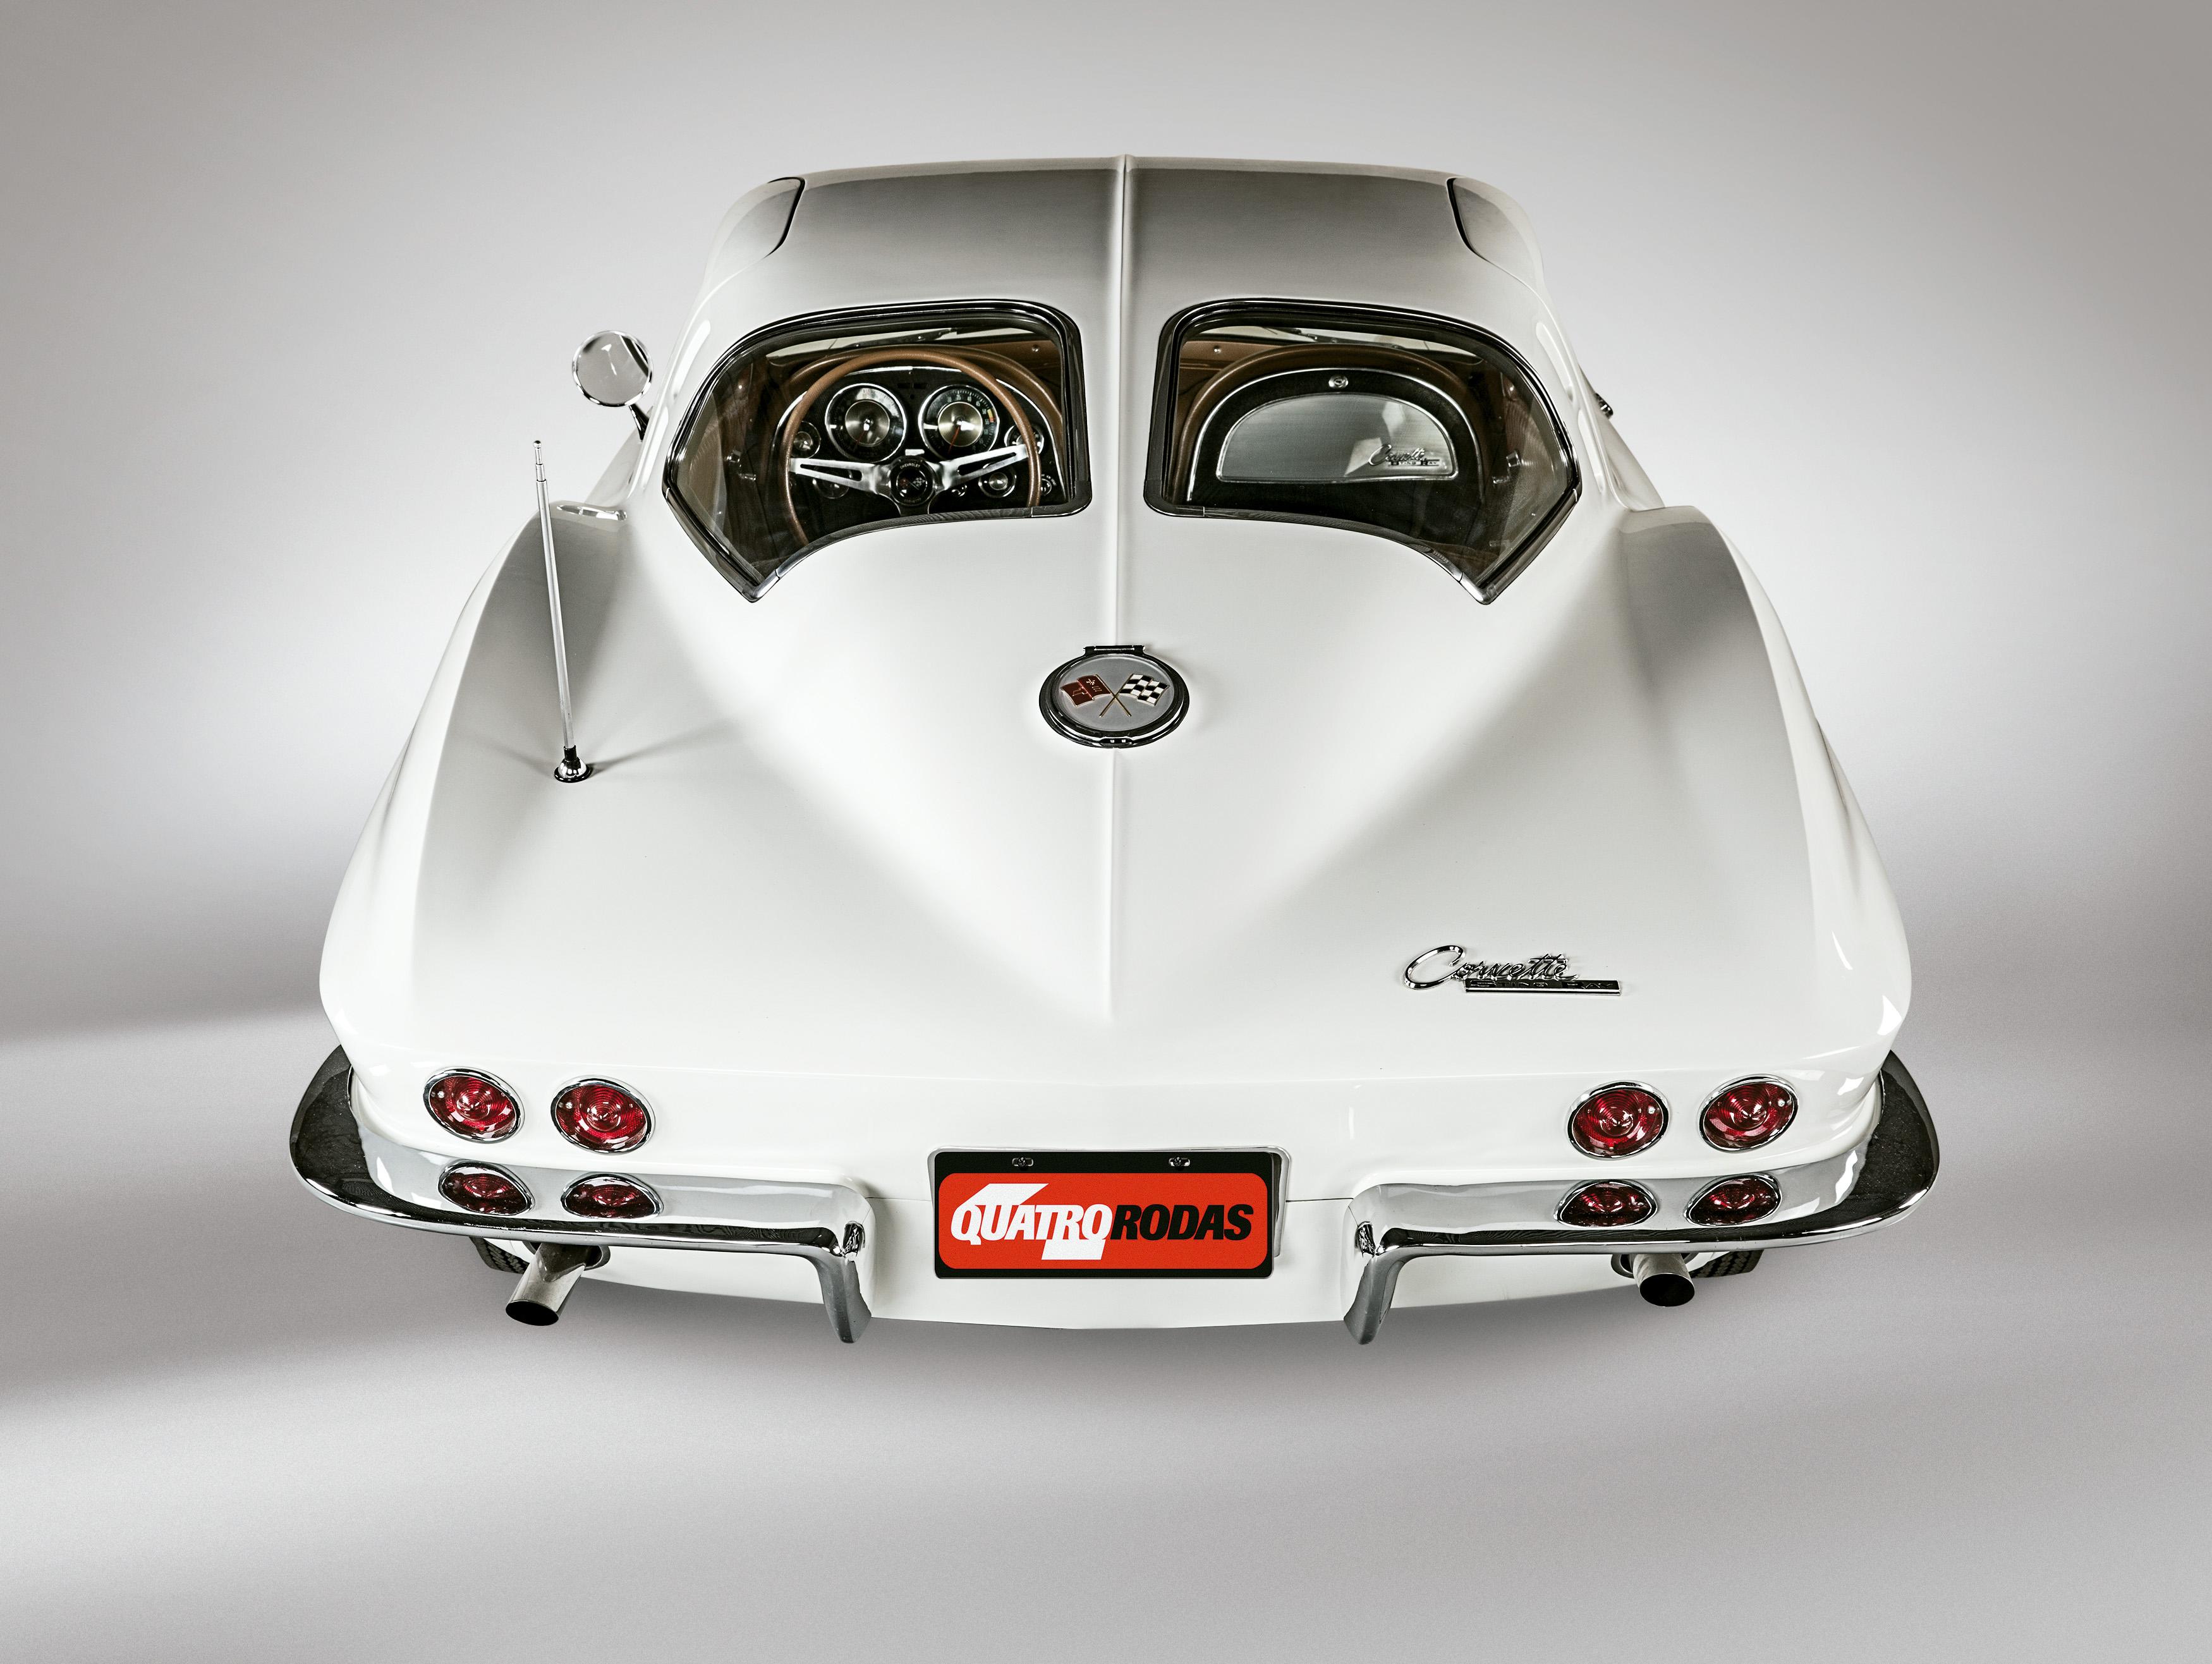 Traseira era inspirada no Bugatti Atlantic (1936-38)